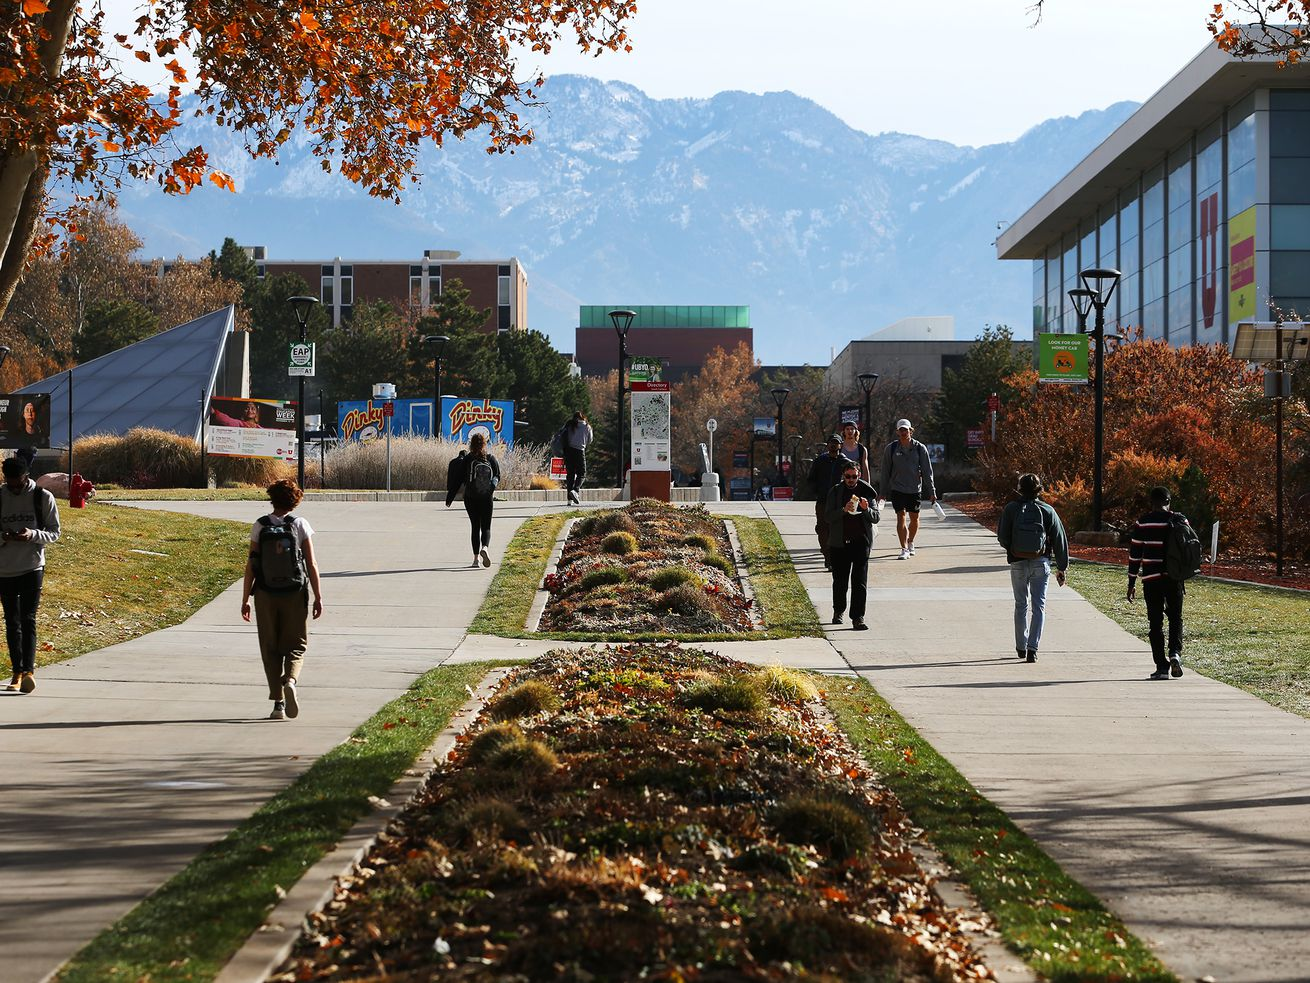 Students walk through the University of Utah campus in Salt Lake City on Monday, Nov. 18, 2019.